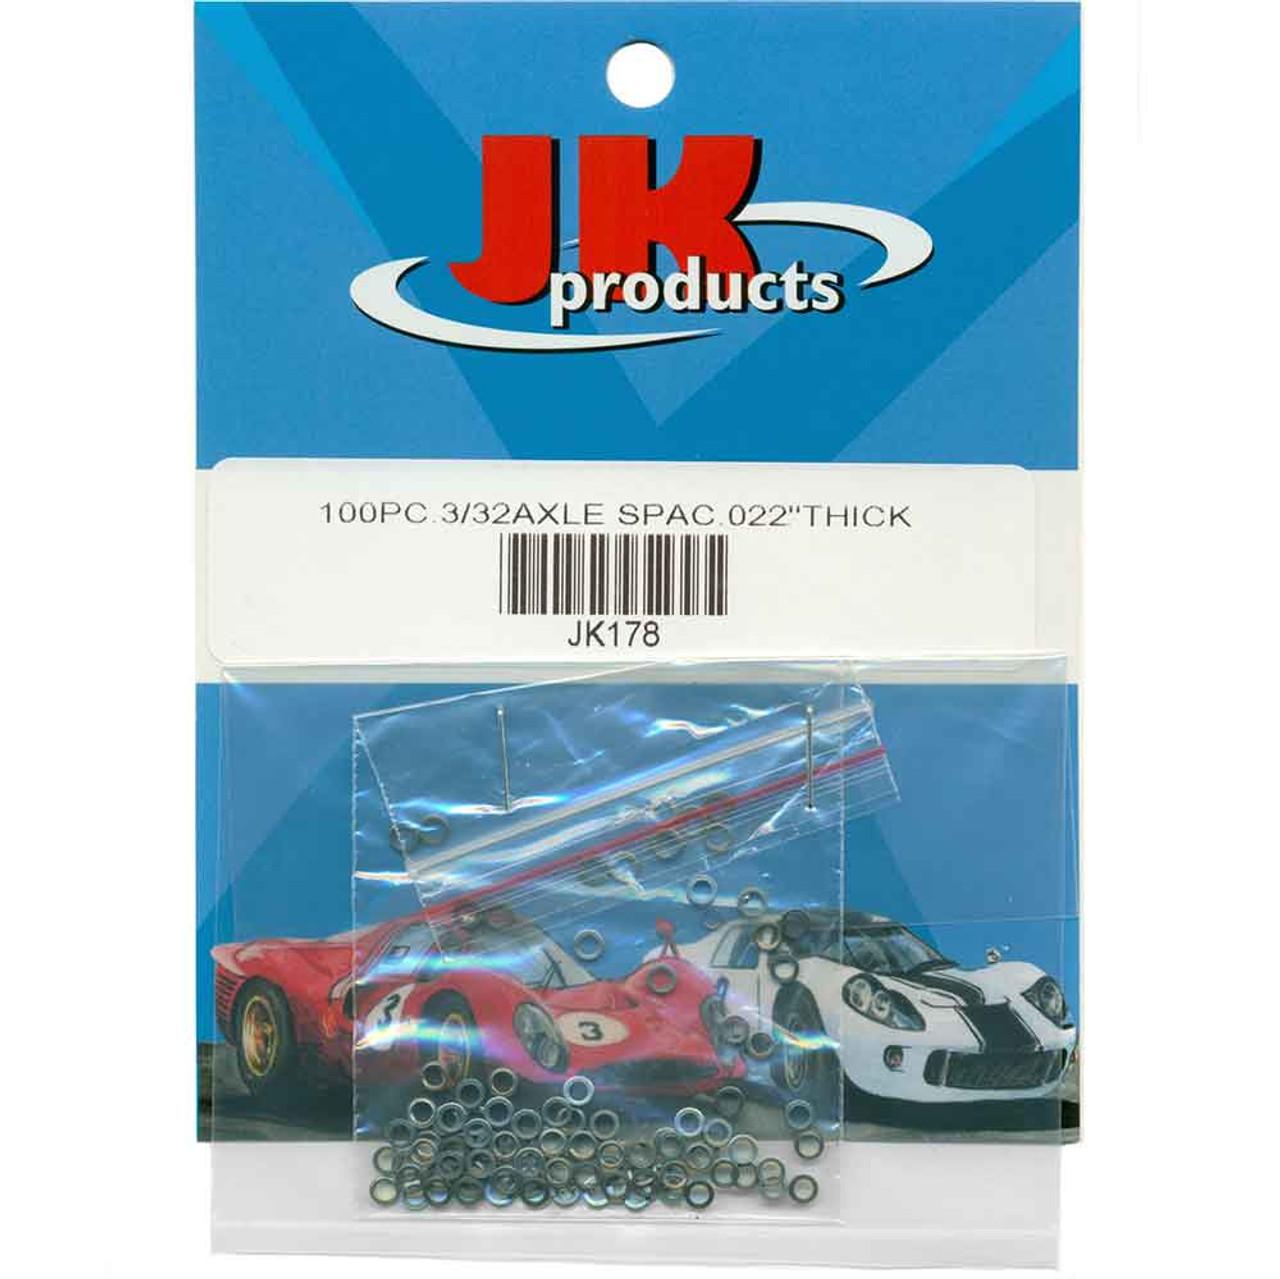 JK .022 Thick 3/32 Axle Spacers - JKU54-100 / JK-178